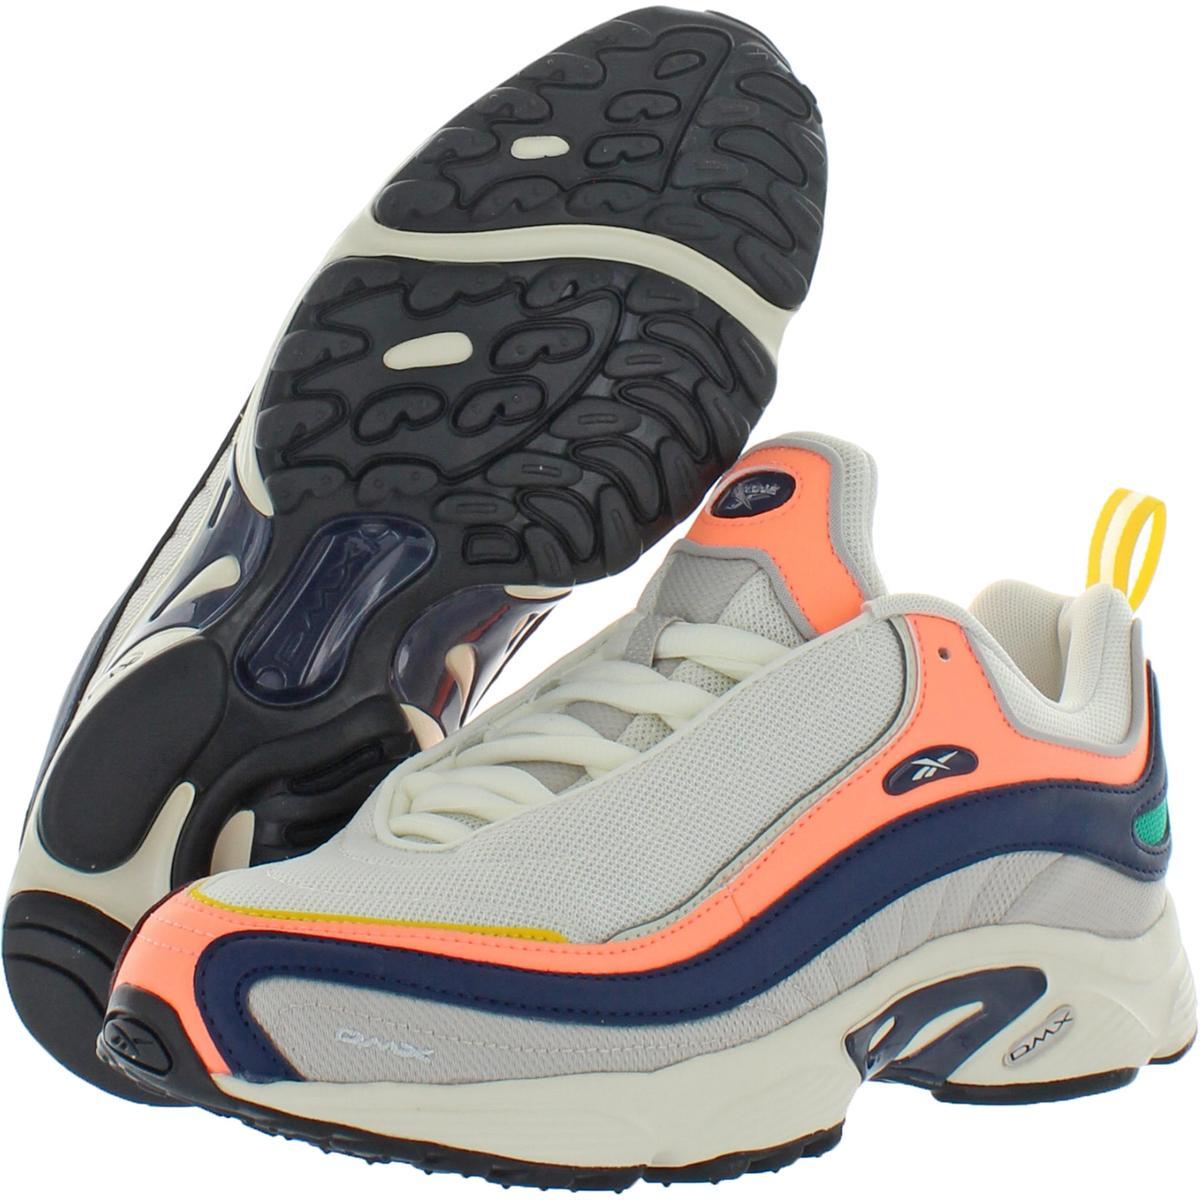 Reebok Mens Daytona DMX Fitness Performance Trainers Sneakers Shoes BHFO 4952